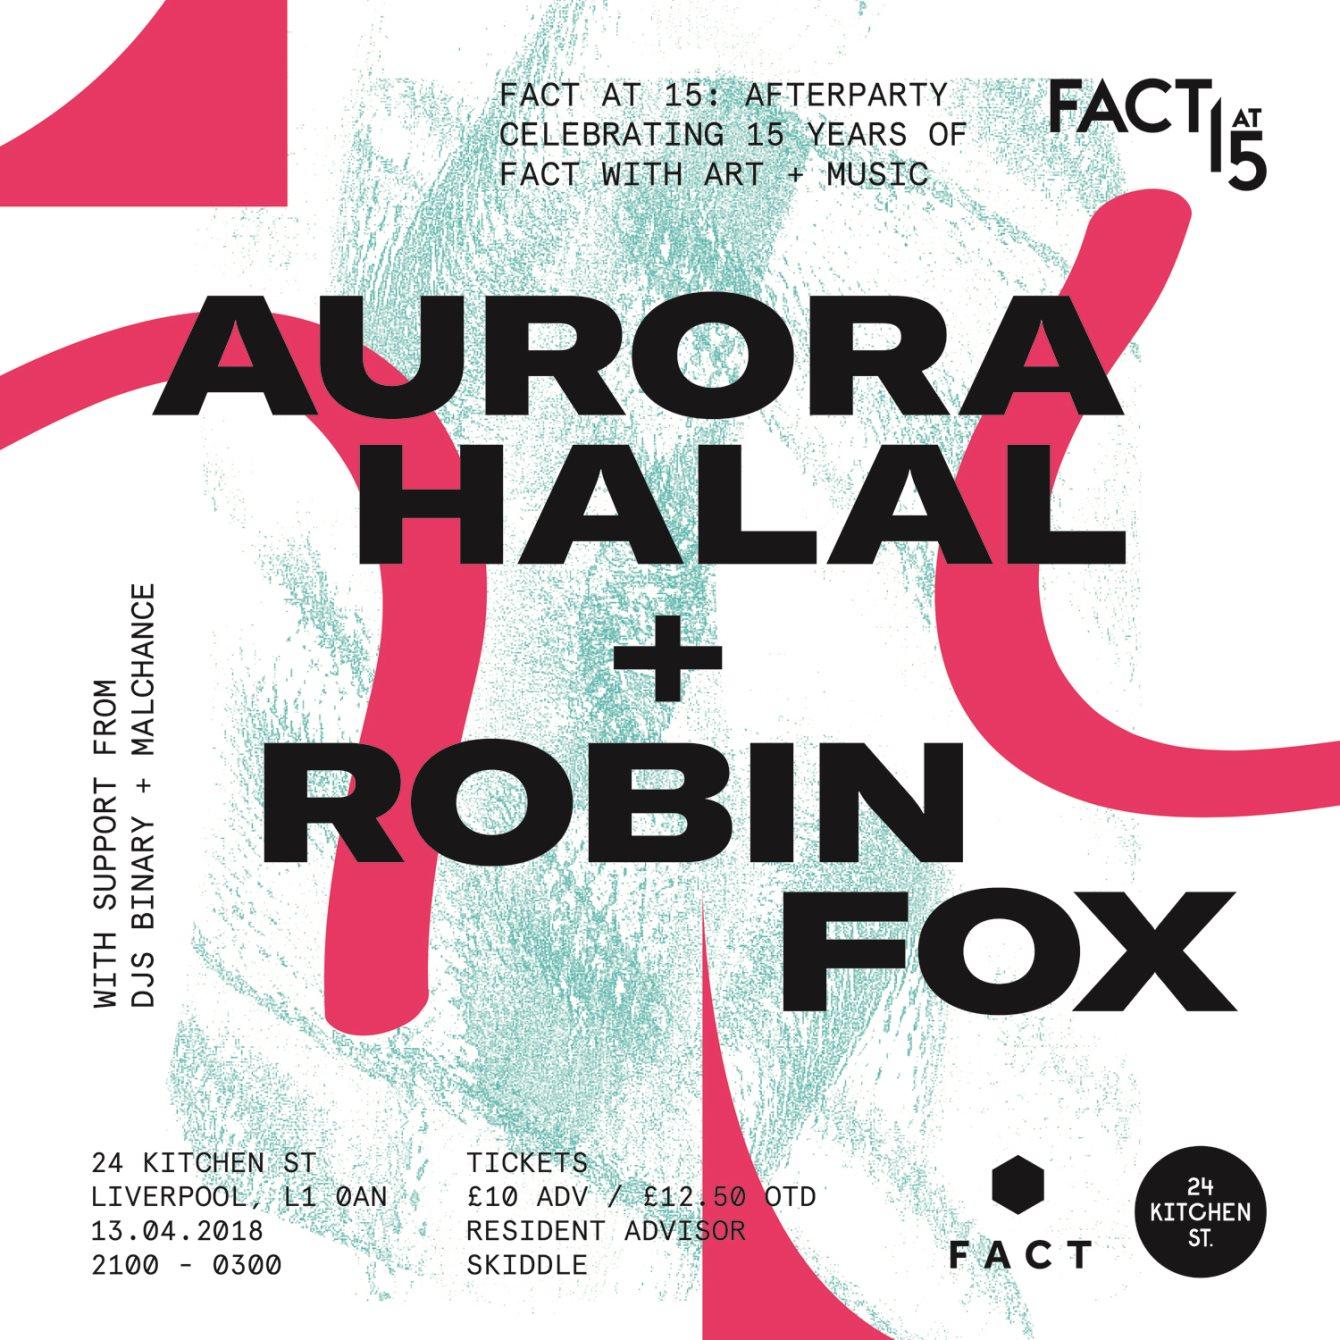 Aurora Halal & Robin Fox - Fact at 15 - Flyer front